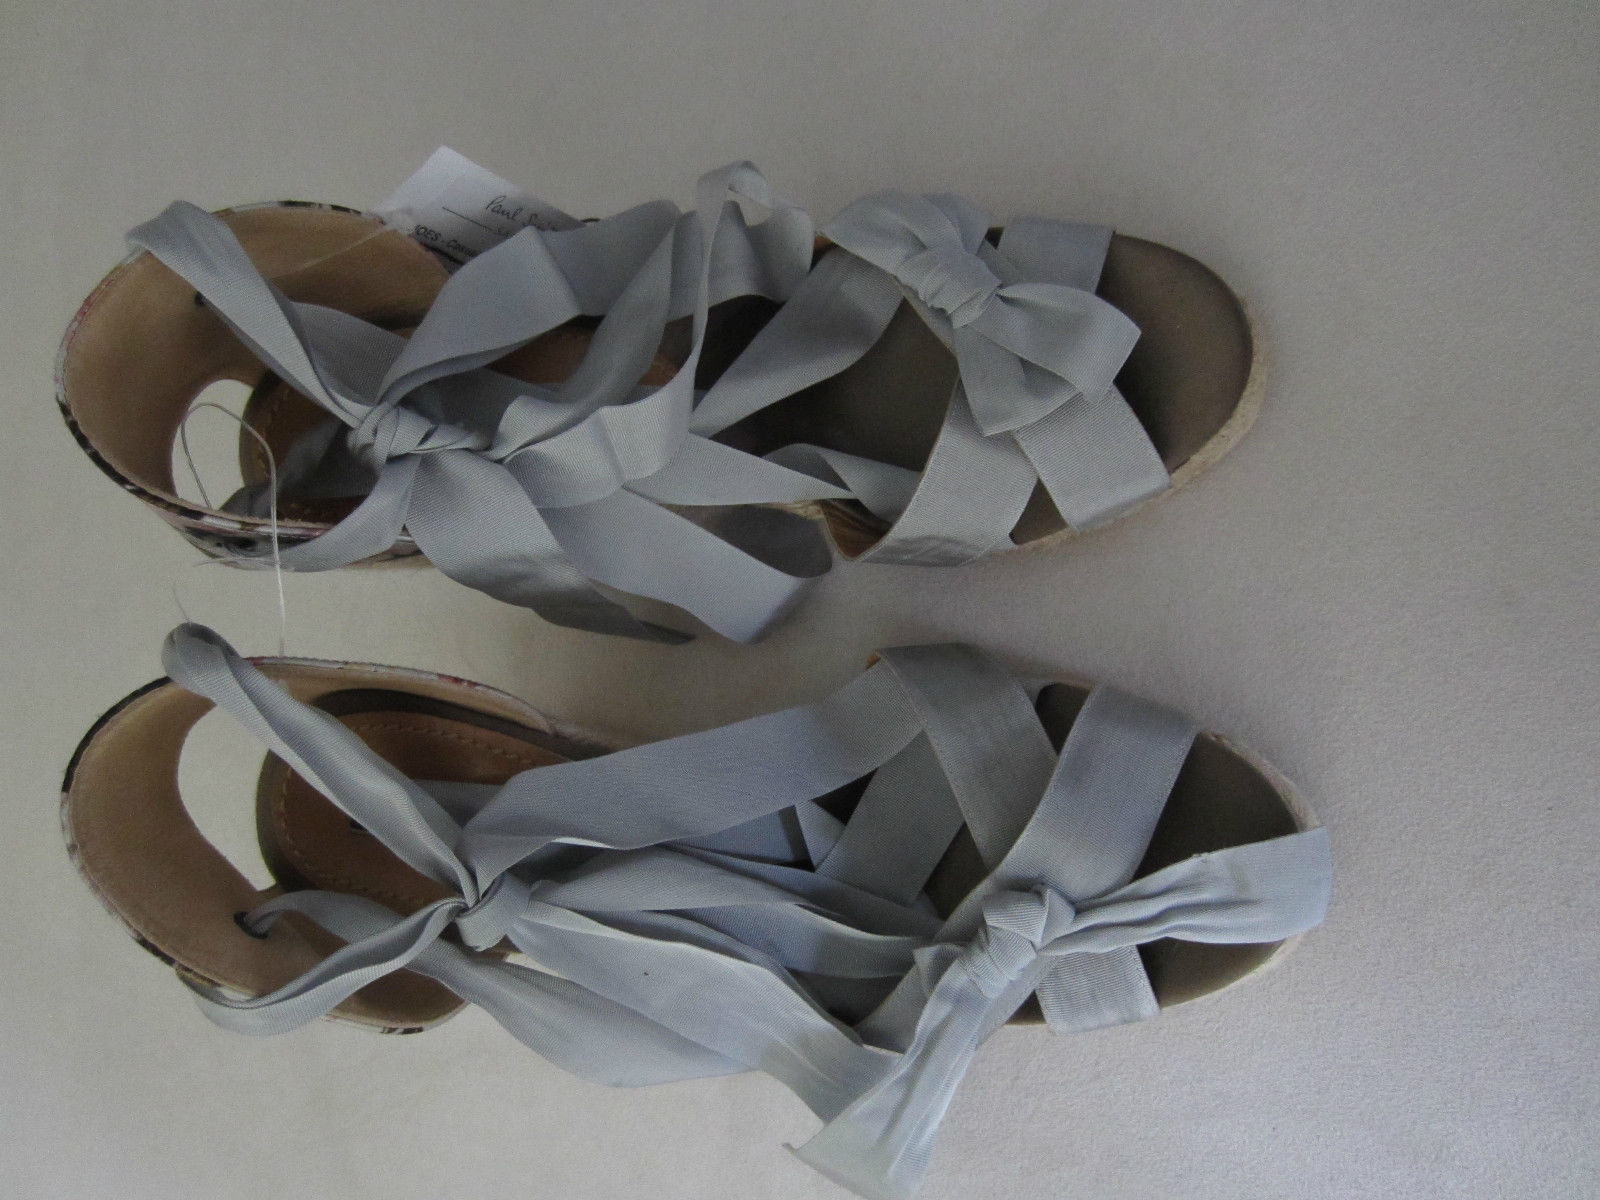 Paul Smith Floral Shoes Ladies